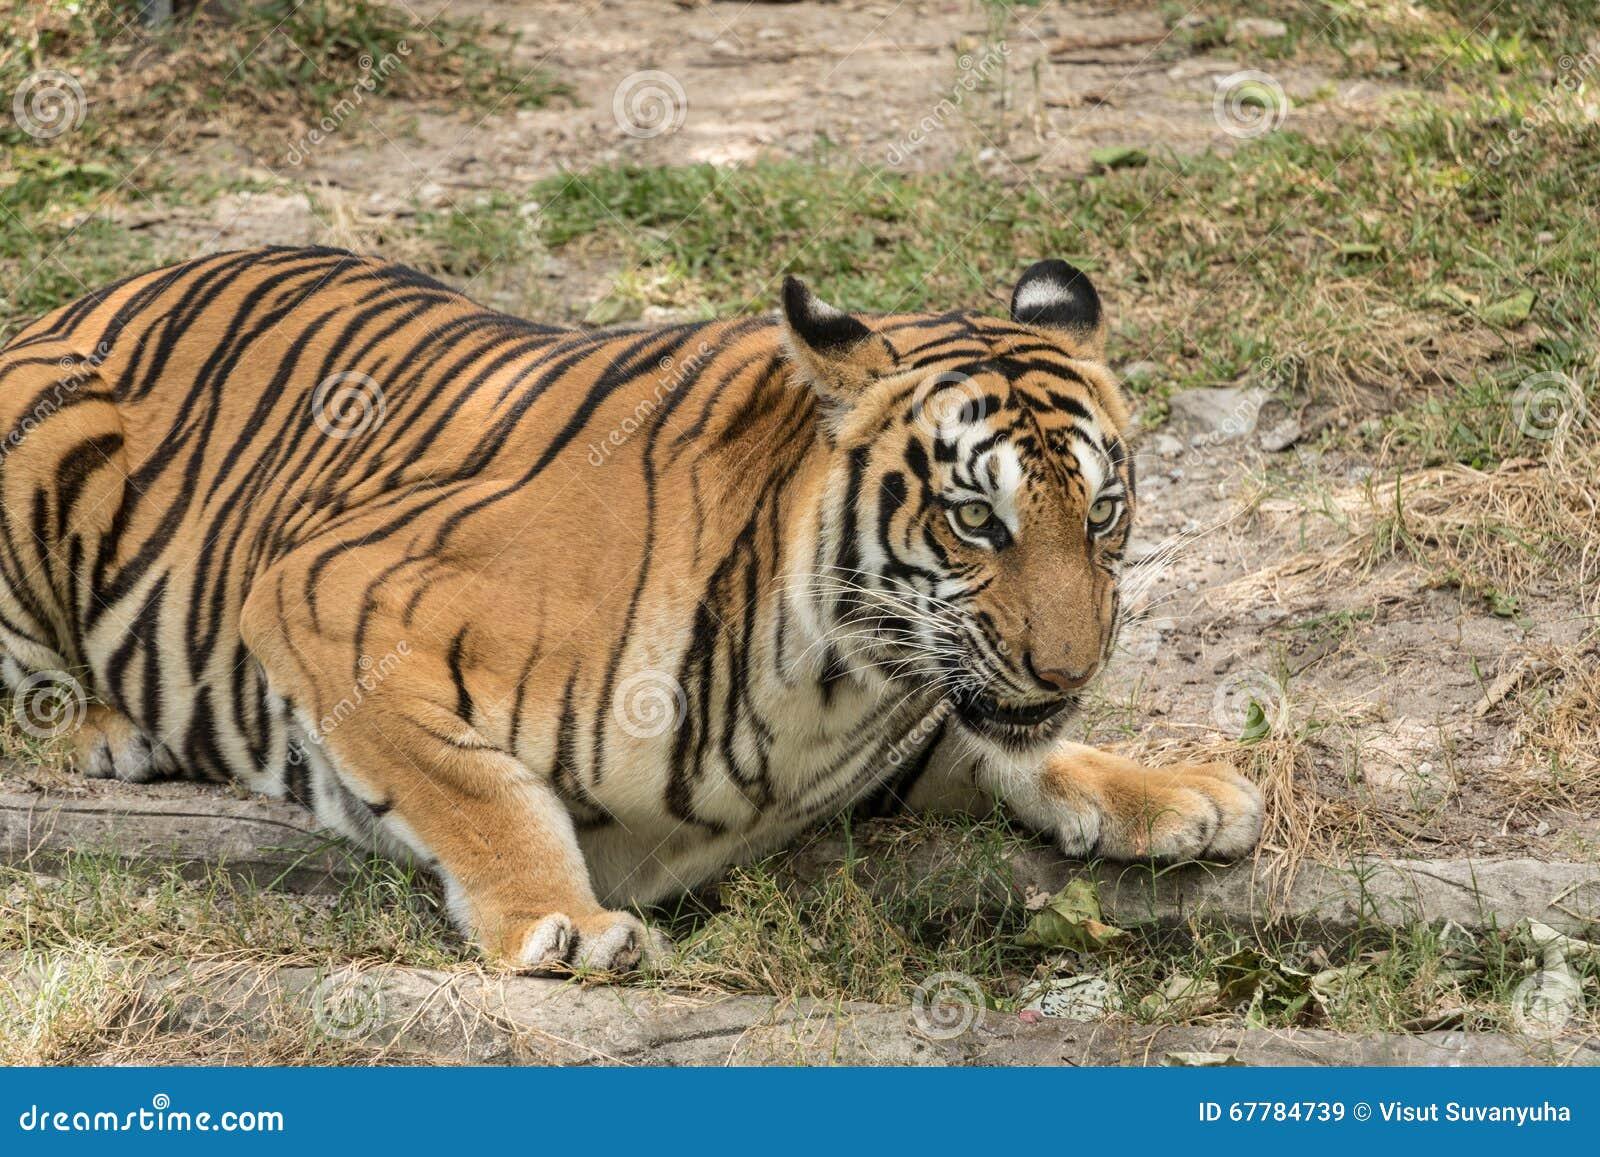 The fierce tiger fearful.